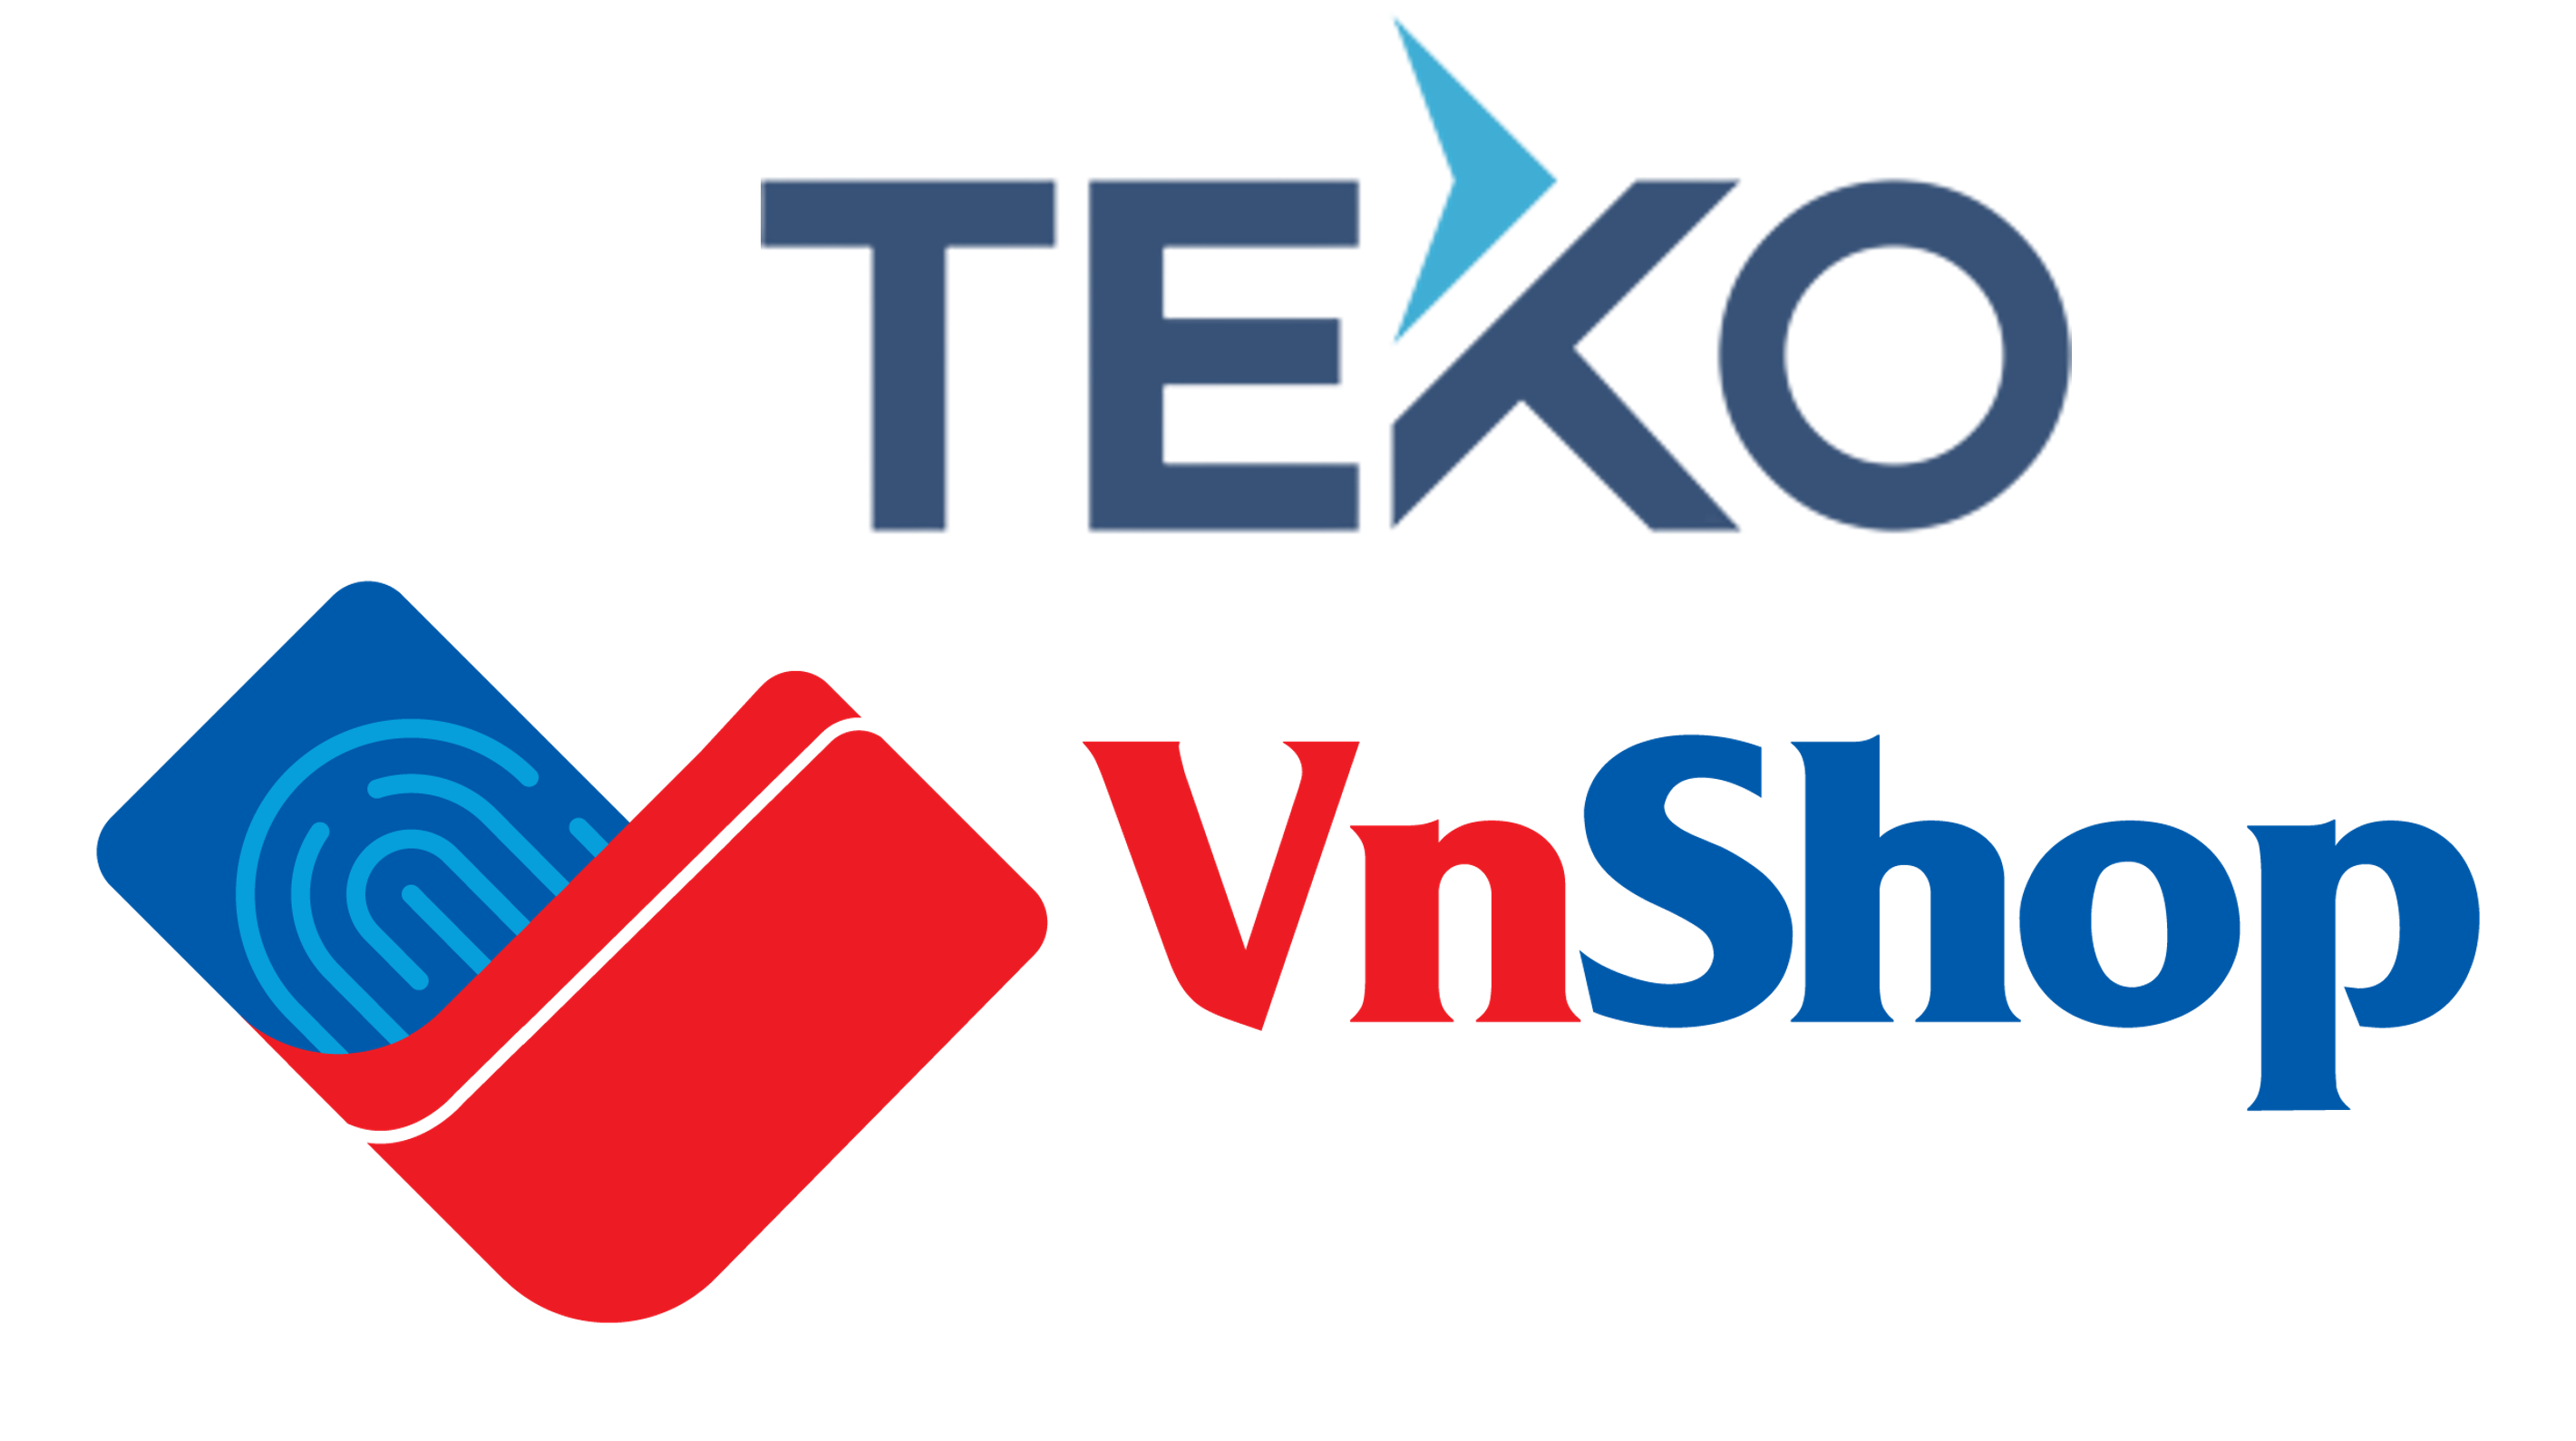 Vietnam's Largest New Retail Company logo